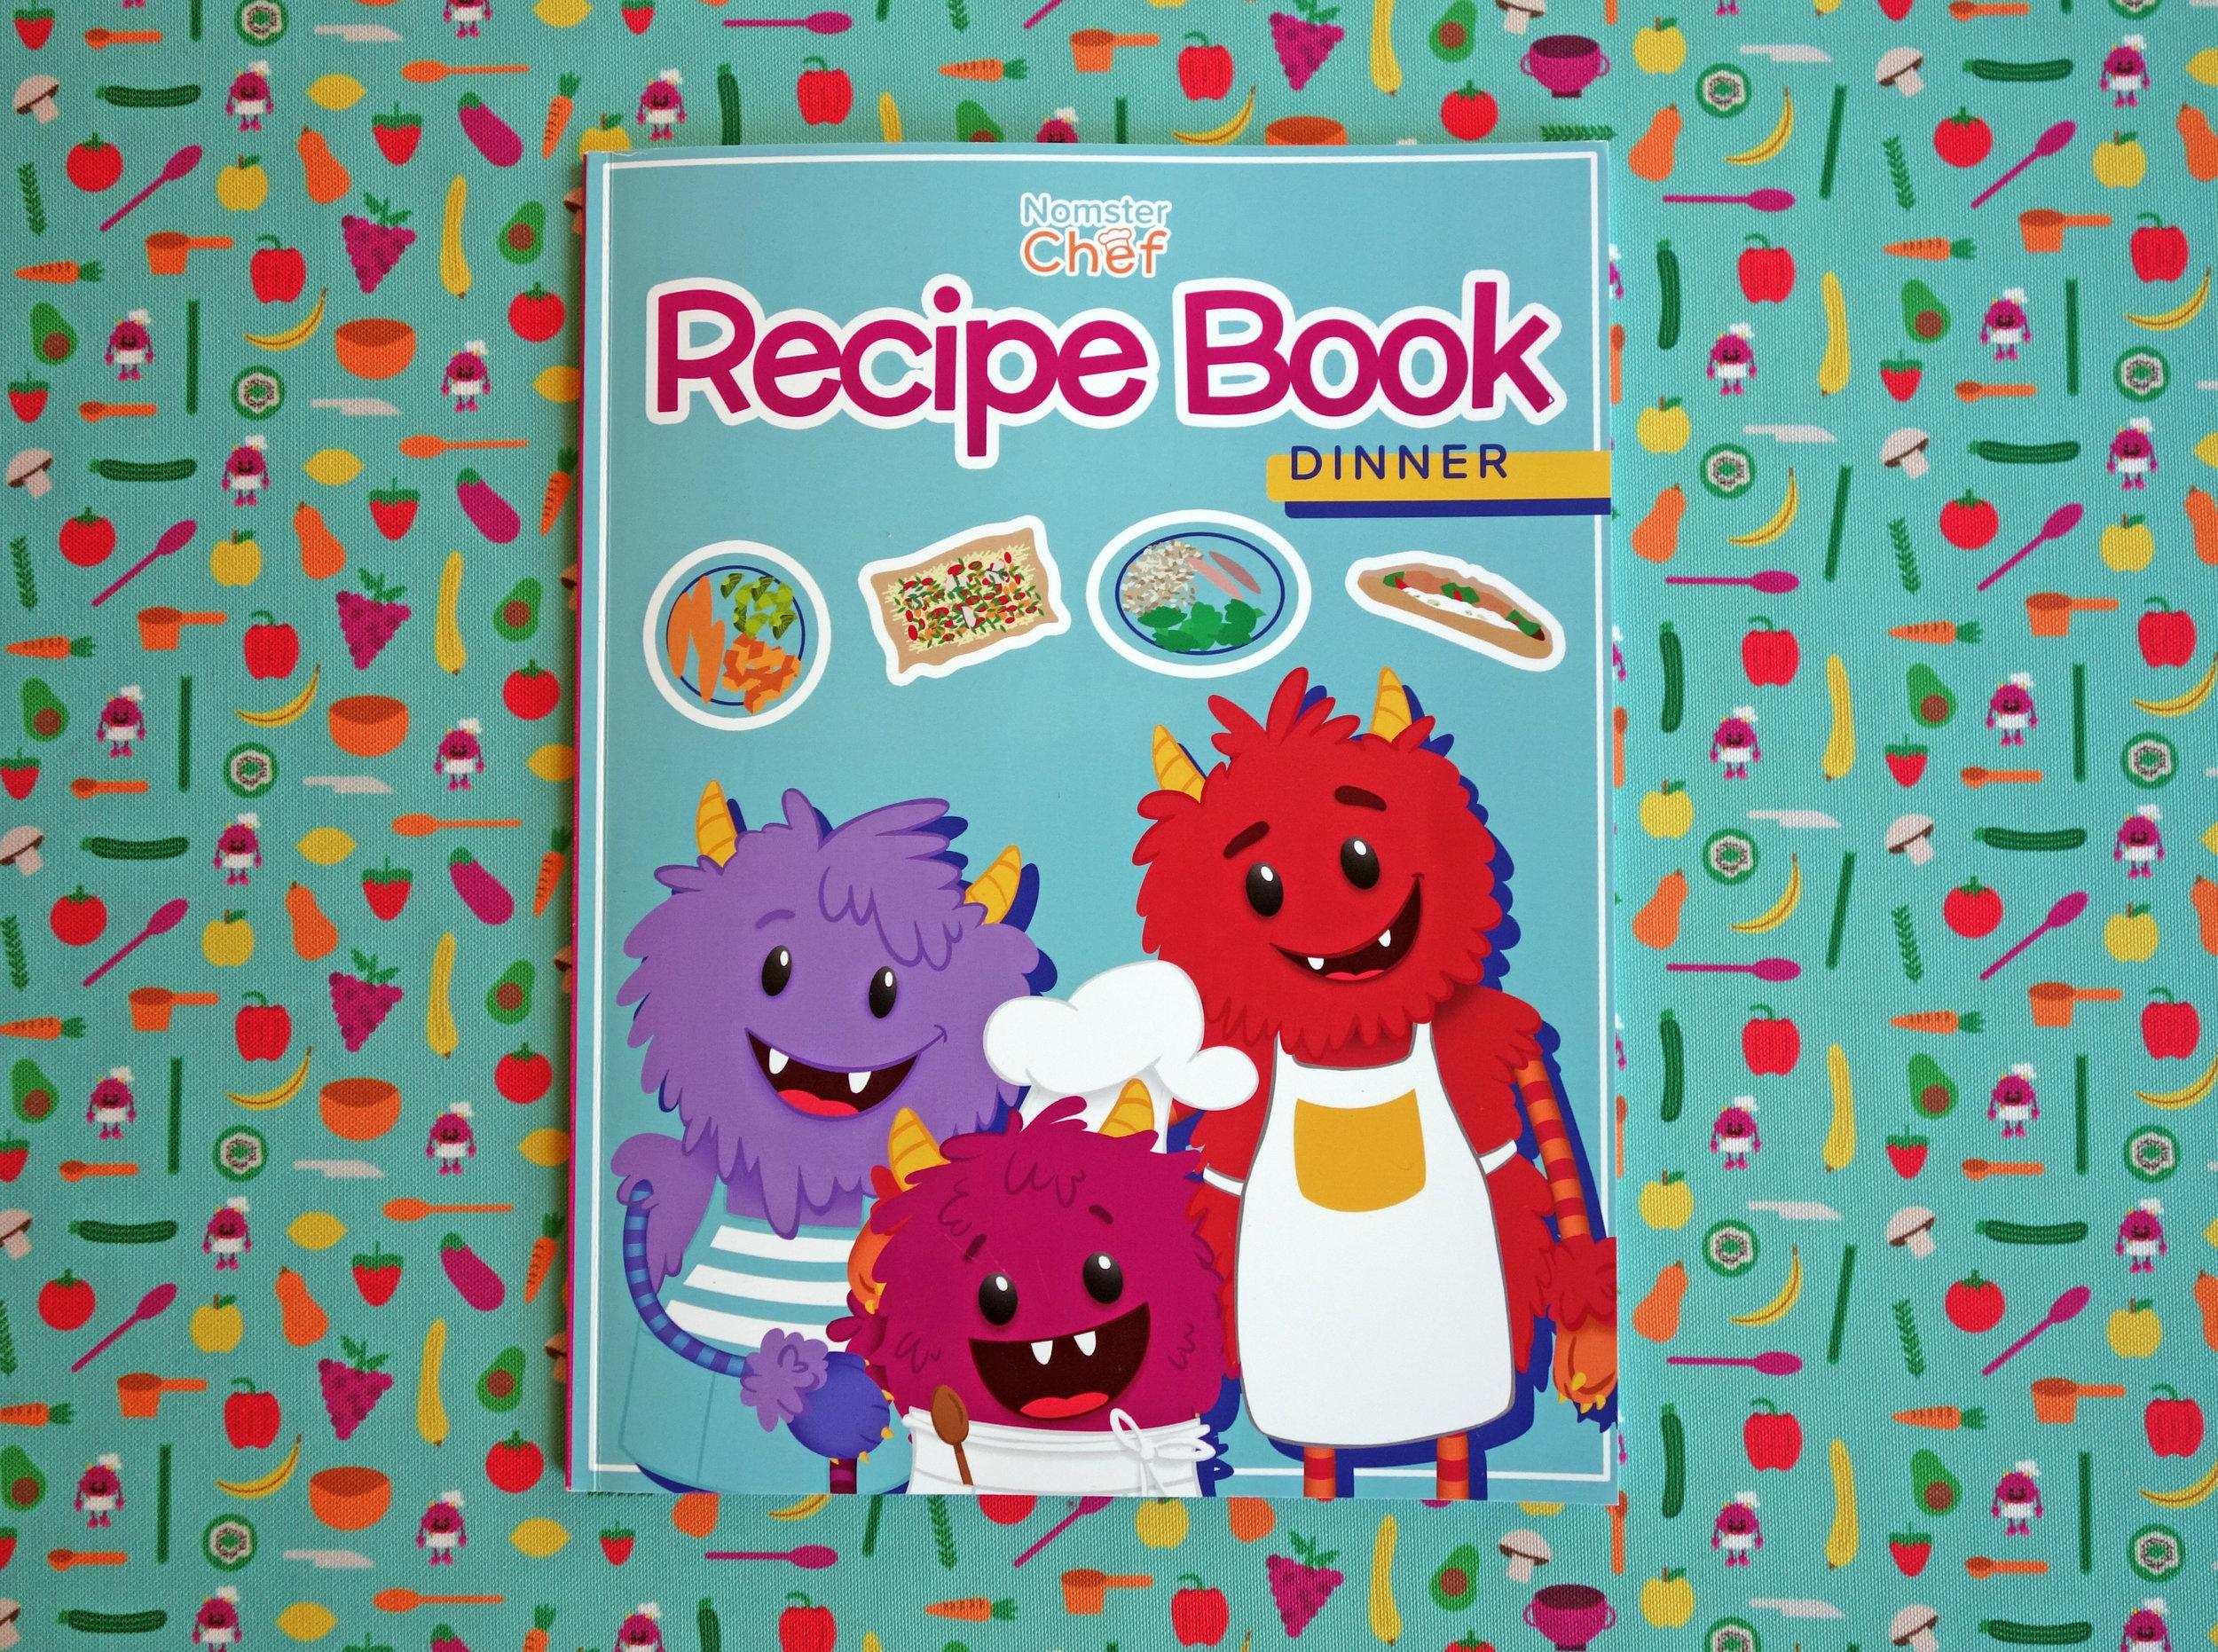 Nomster Chef Dinner Recipe Book - Cookbook for Kids